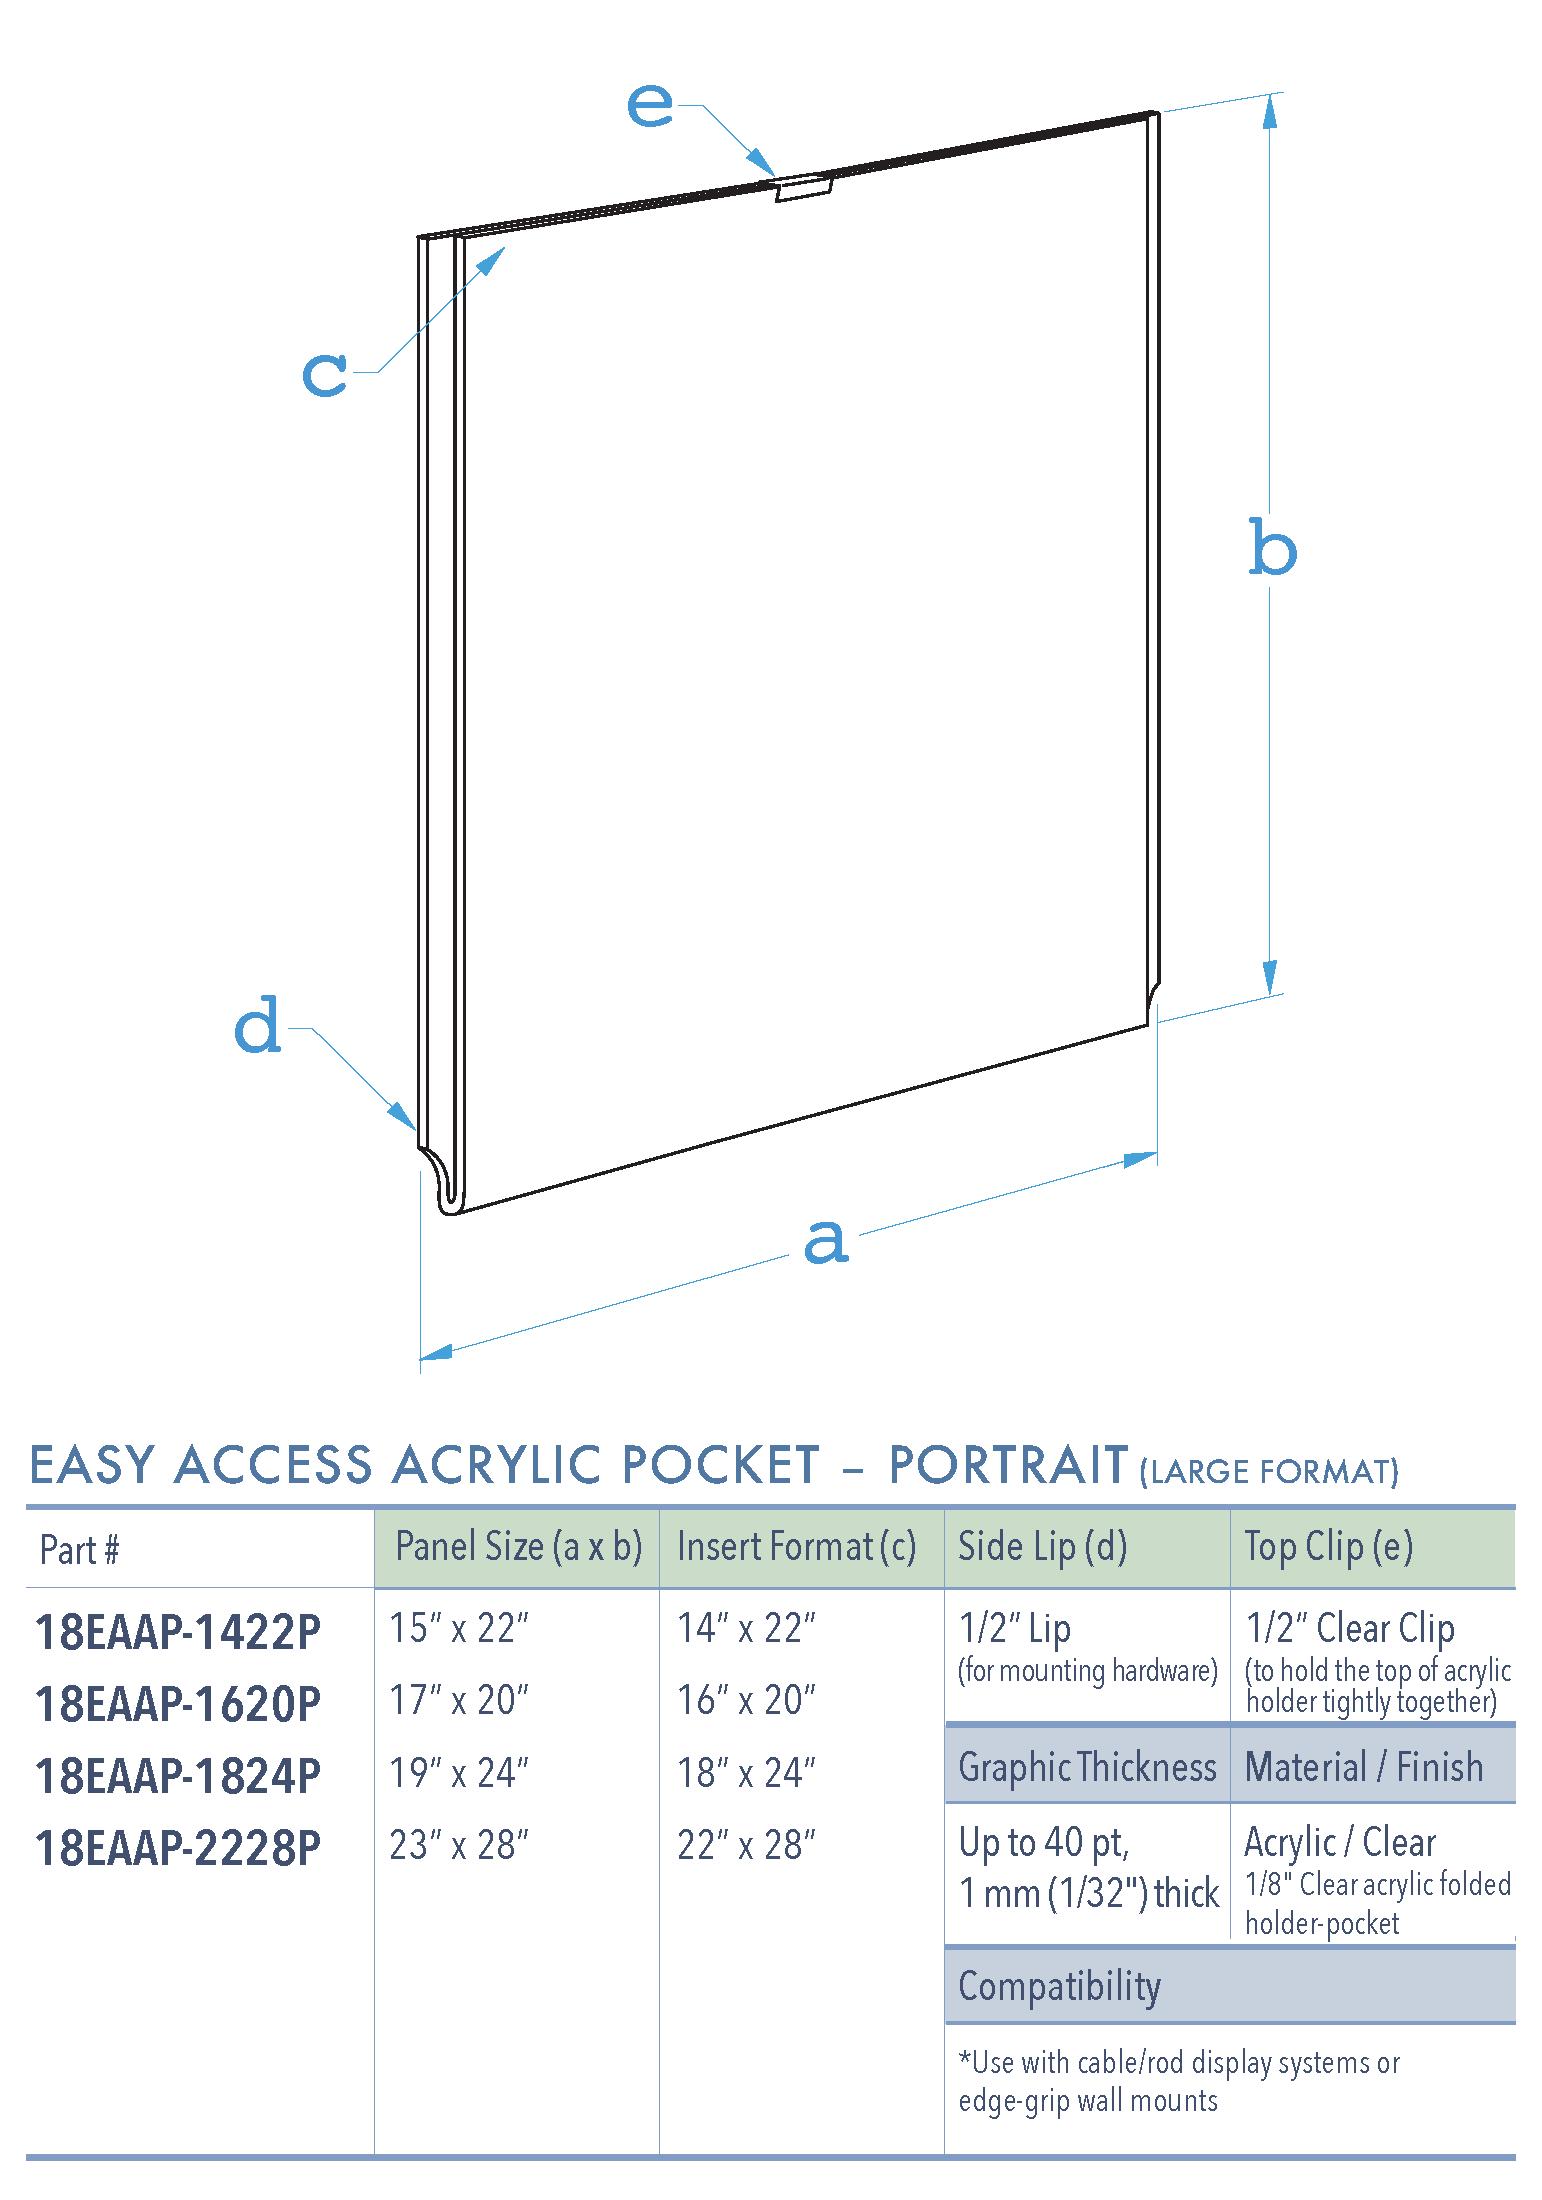 Specifications for 18EAAP-INSERT-PORTRAIT-LR